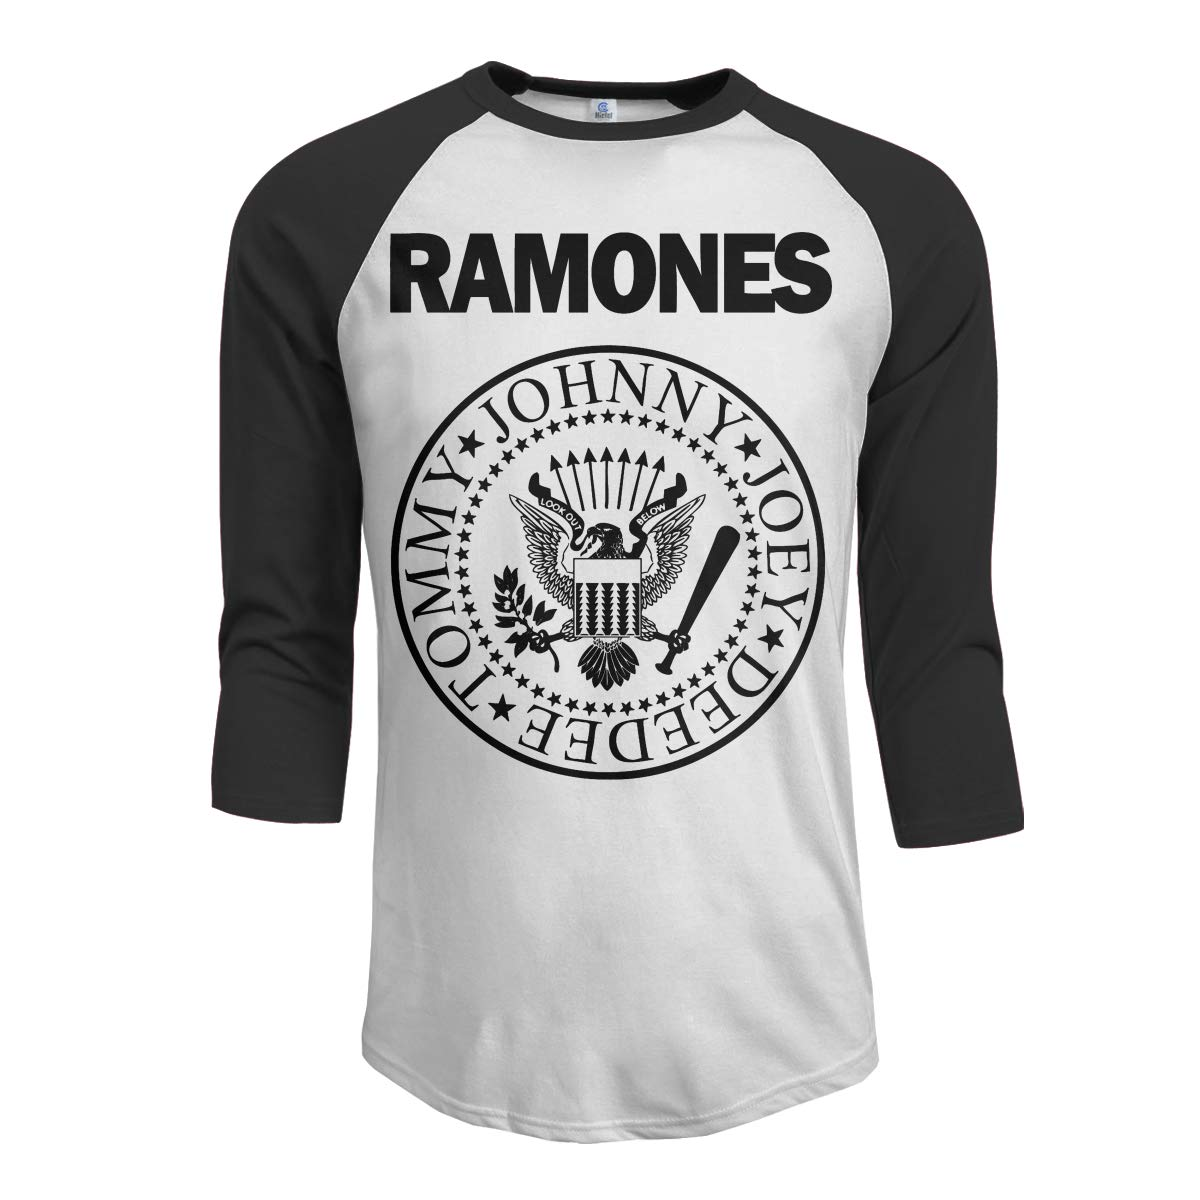 JeremiahR Ramones Men's 3/4 Sleeve Raglan Baseball Tshirts Black